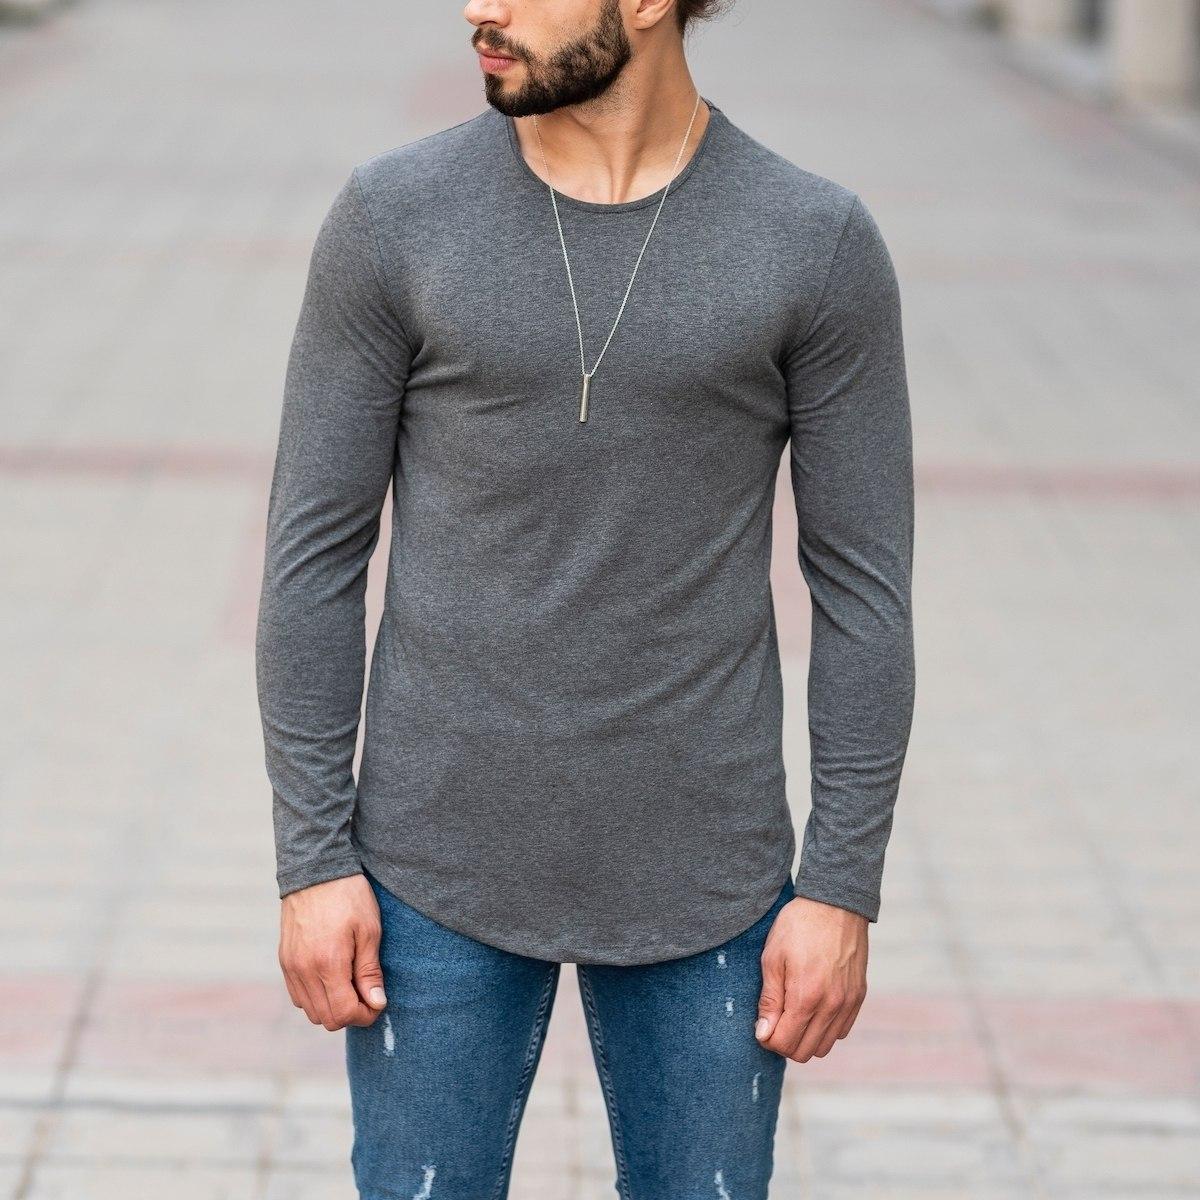 Basic Sweatshirt In Gray